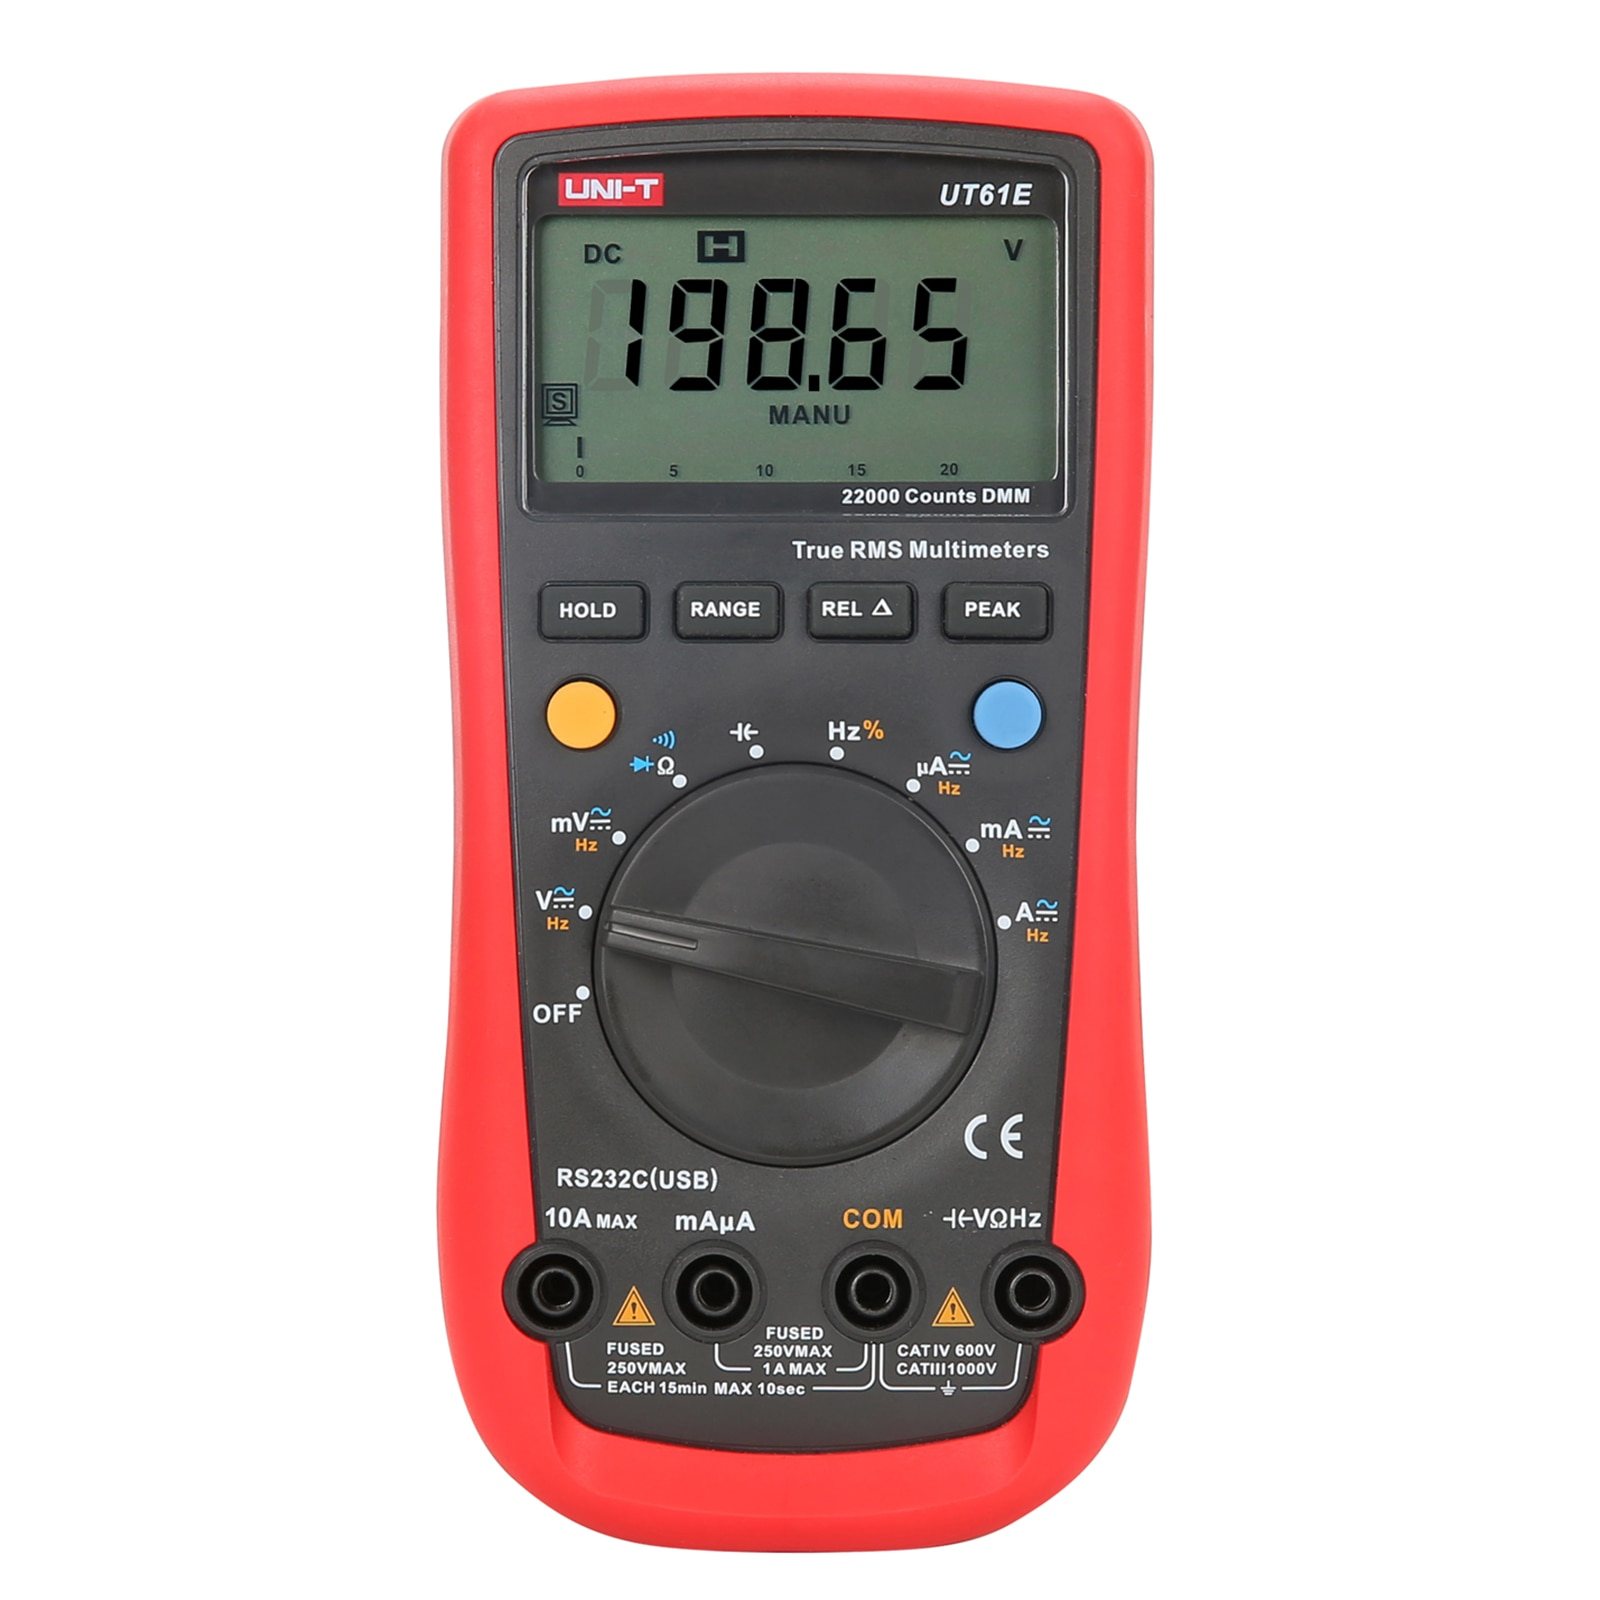 UNI-T Digital Multimeter UT61E 6000 Counts Manual Frequency Temperature Voltage Ammeter AC DC DMM Capacitor Tester NCV